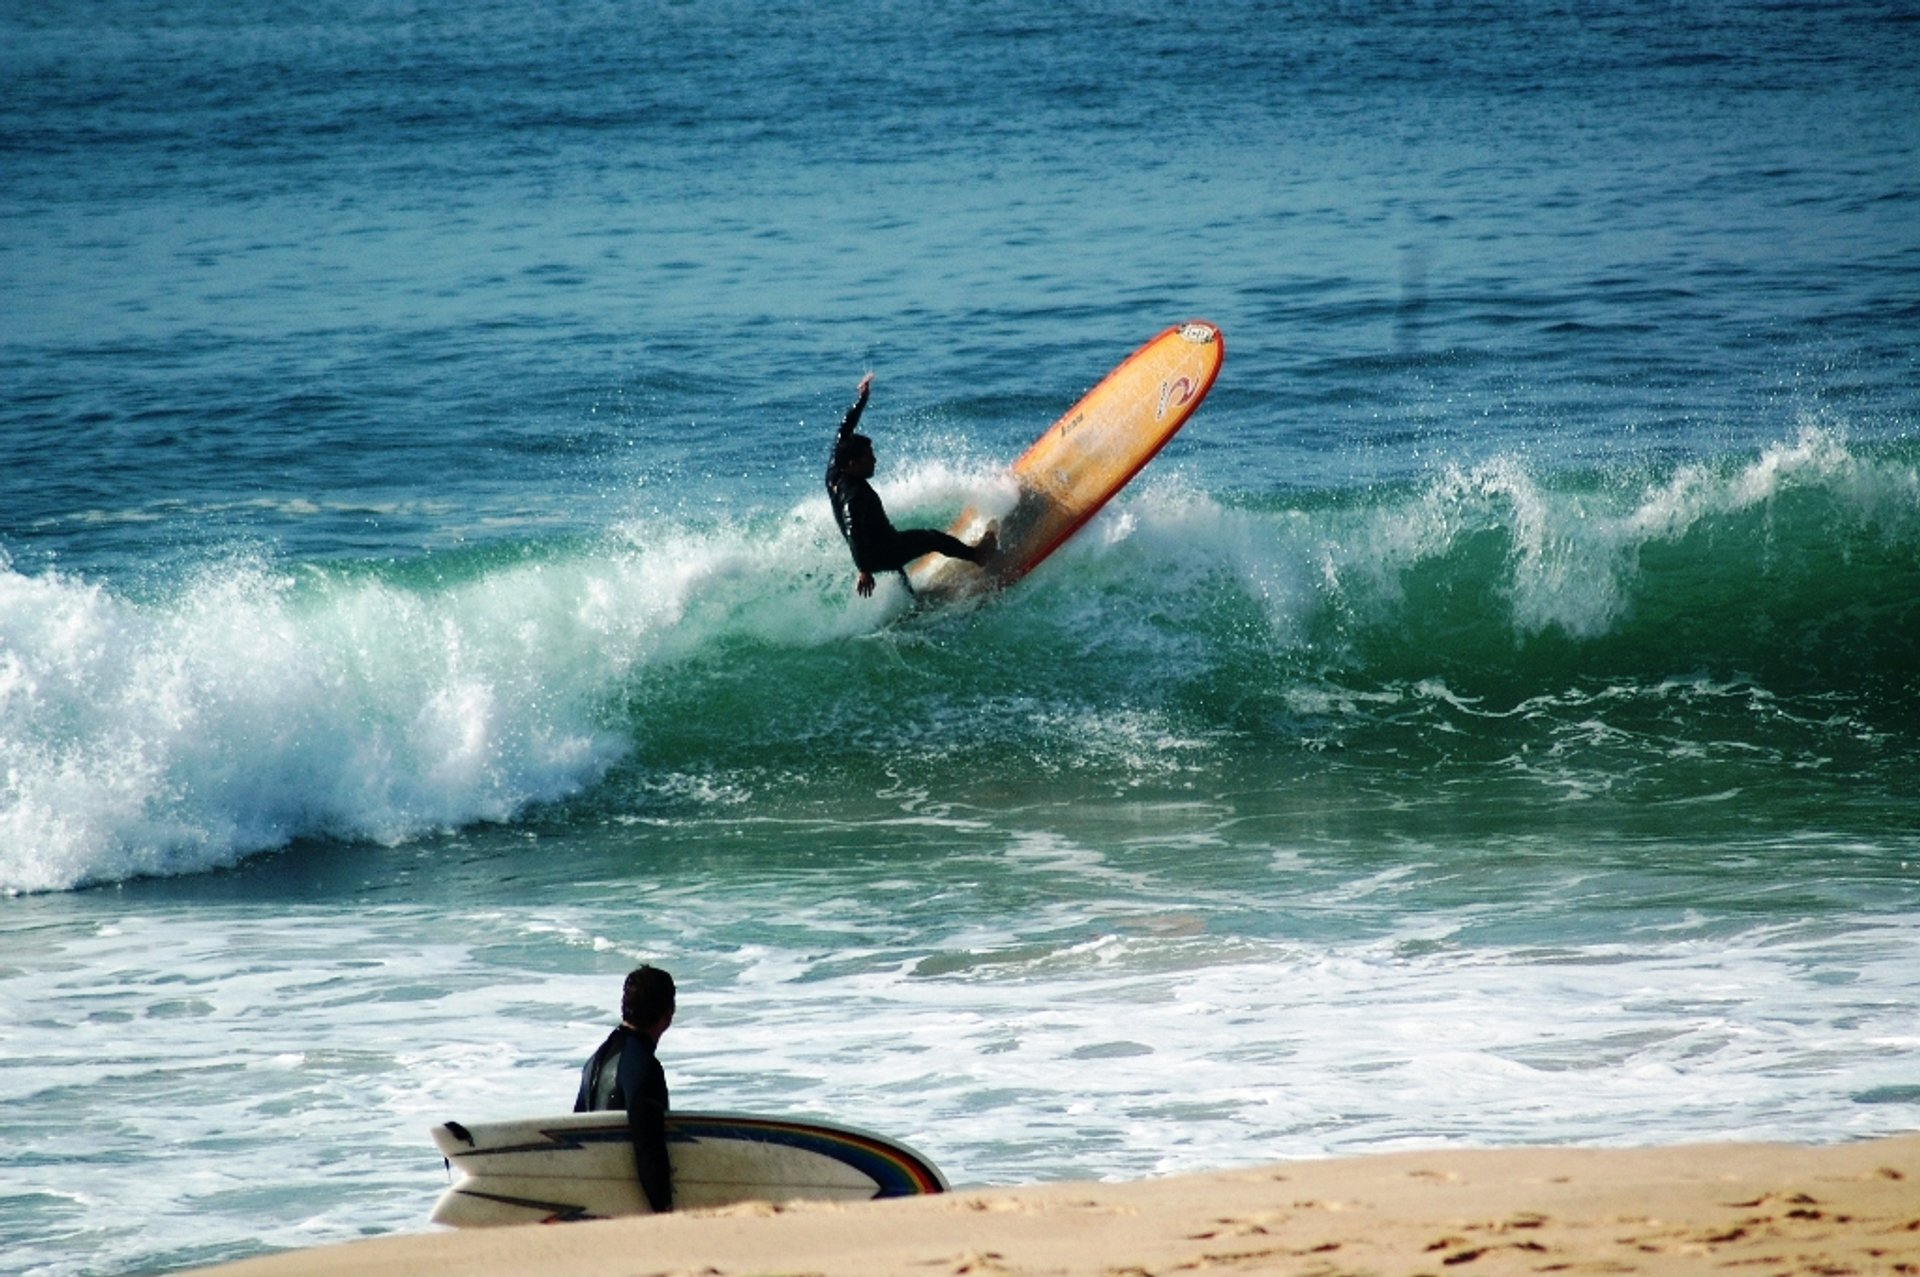 Surfing Atlantic in Portugal - Best Season 2019